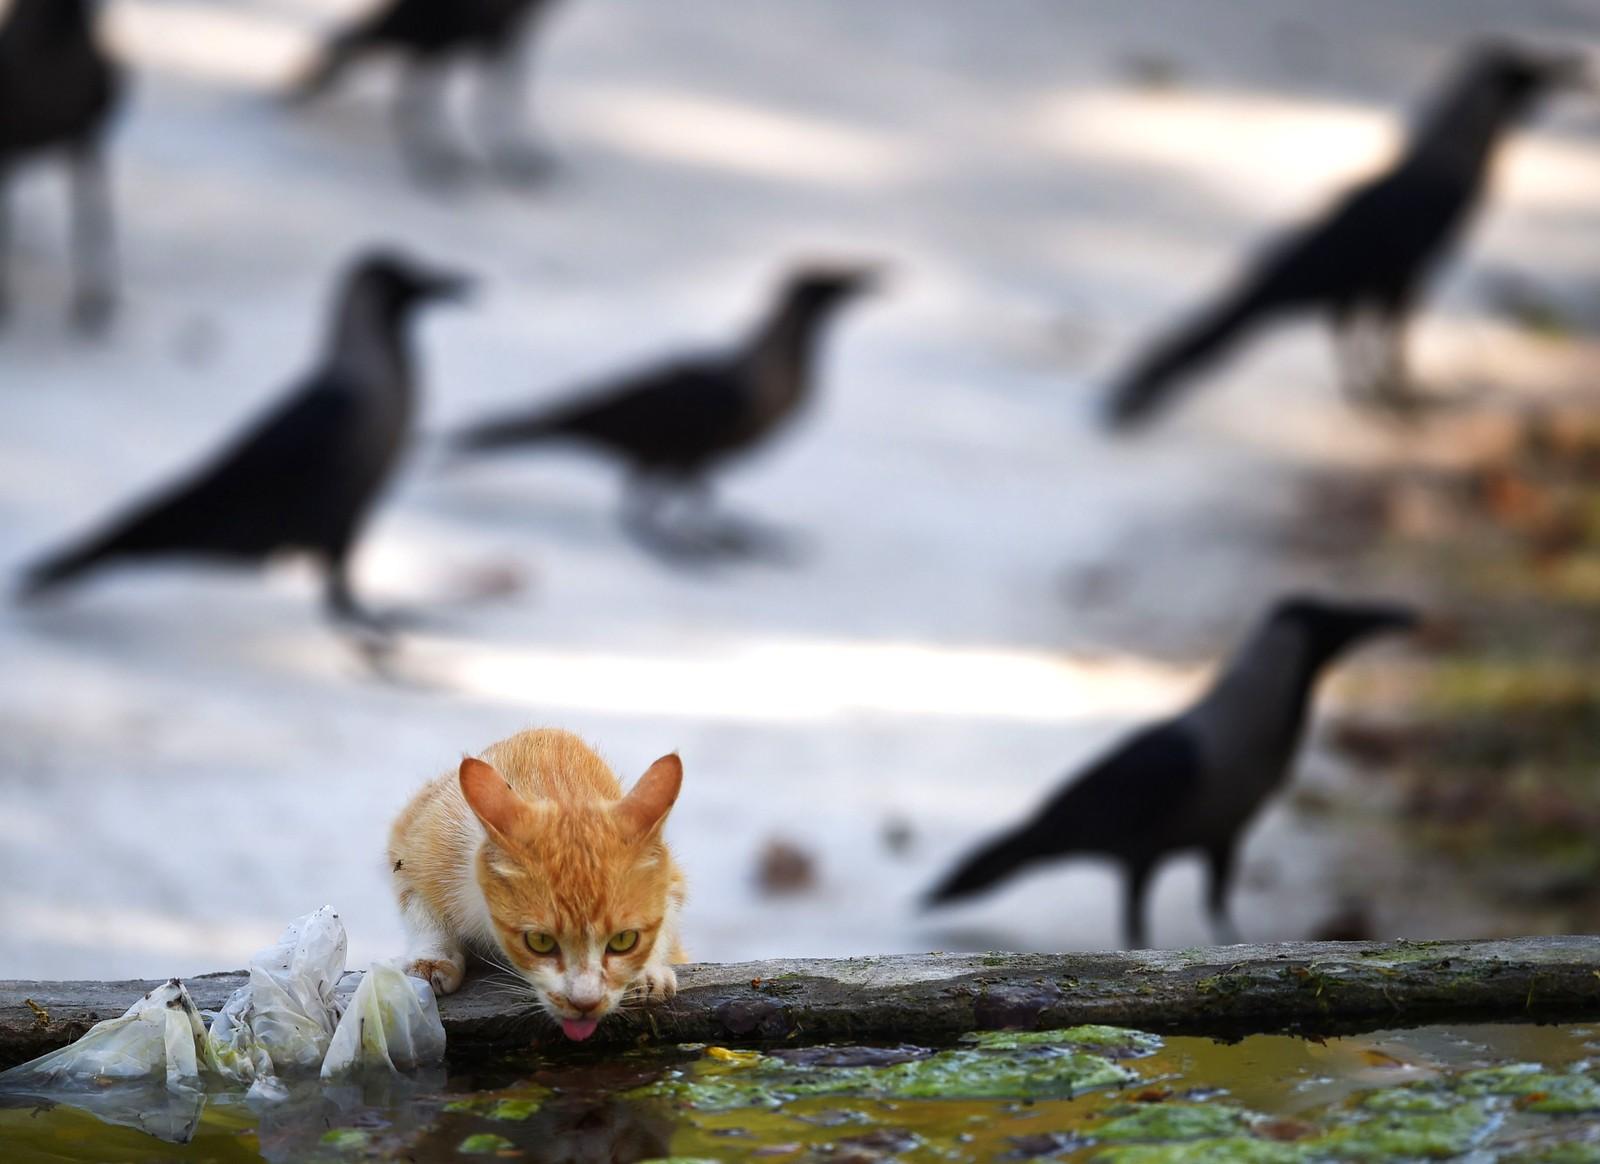 En tørst katt drikker vann under en varm dag i en dyrehage i Islamabad i Pakistan.